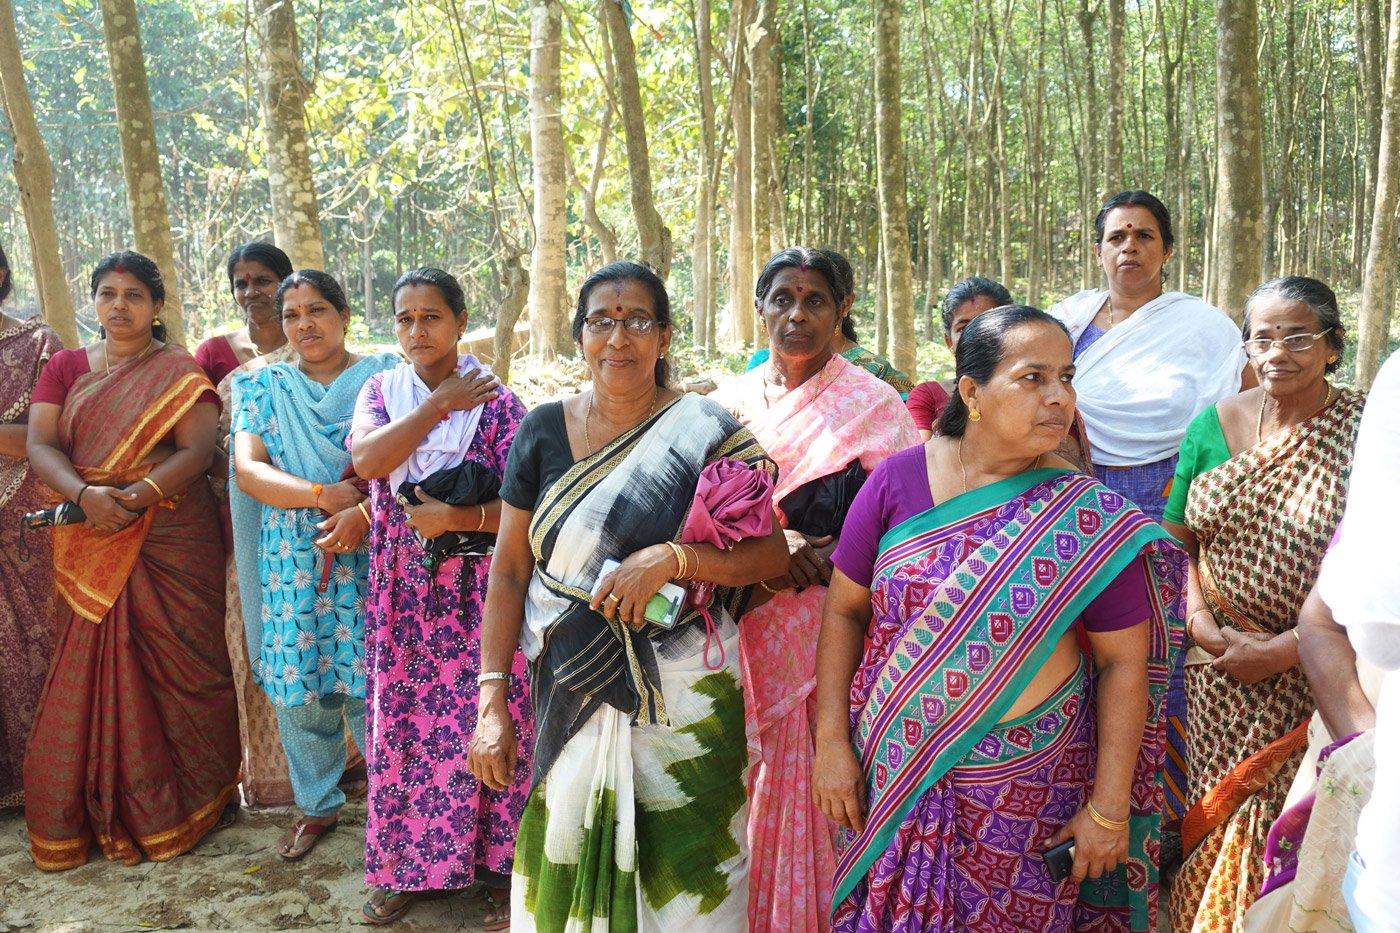 Kerala's women farmers rise above the flood